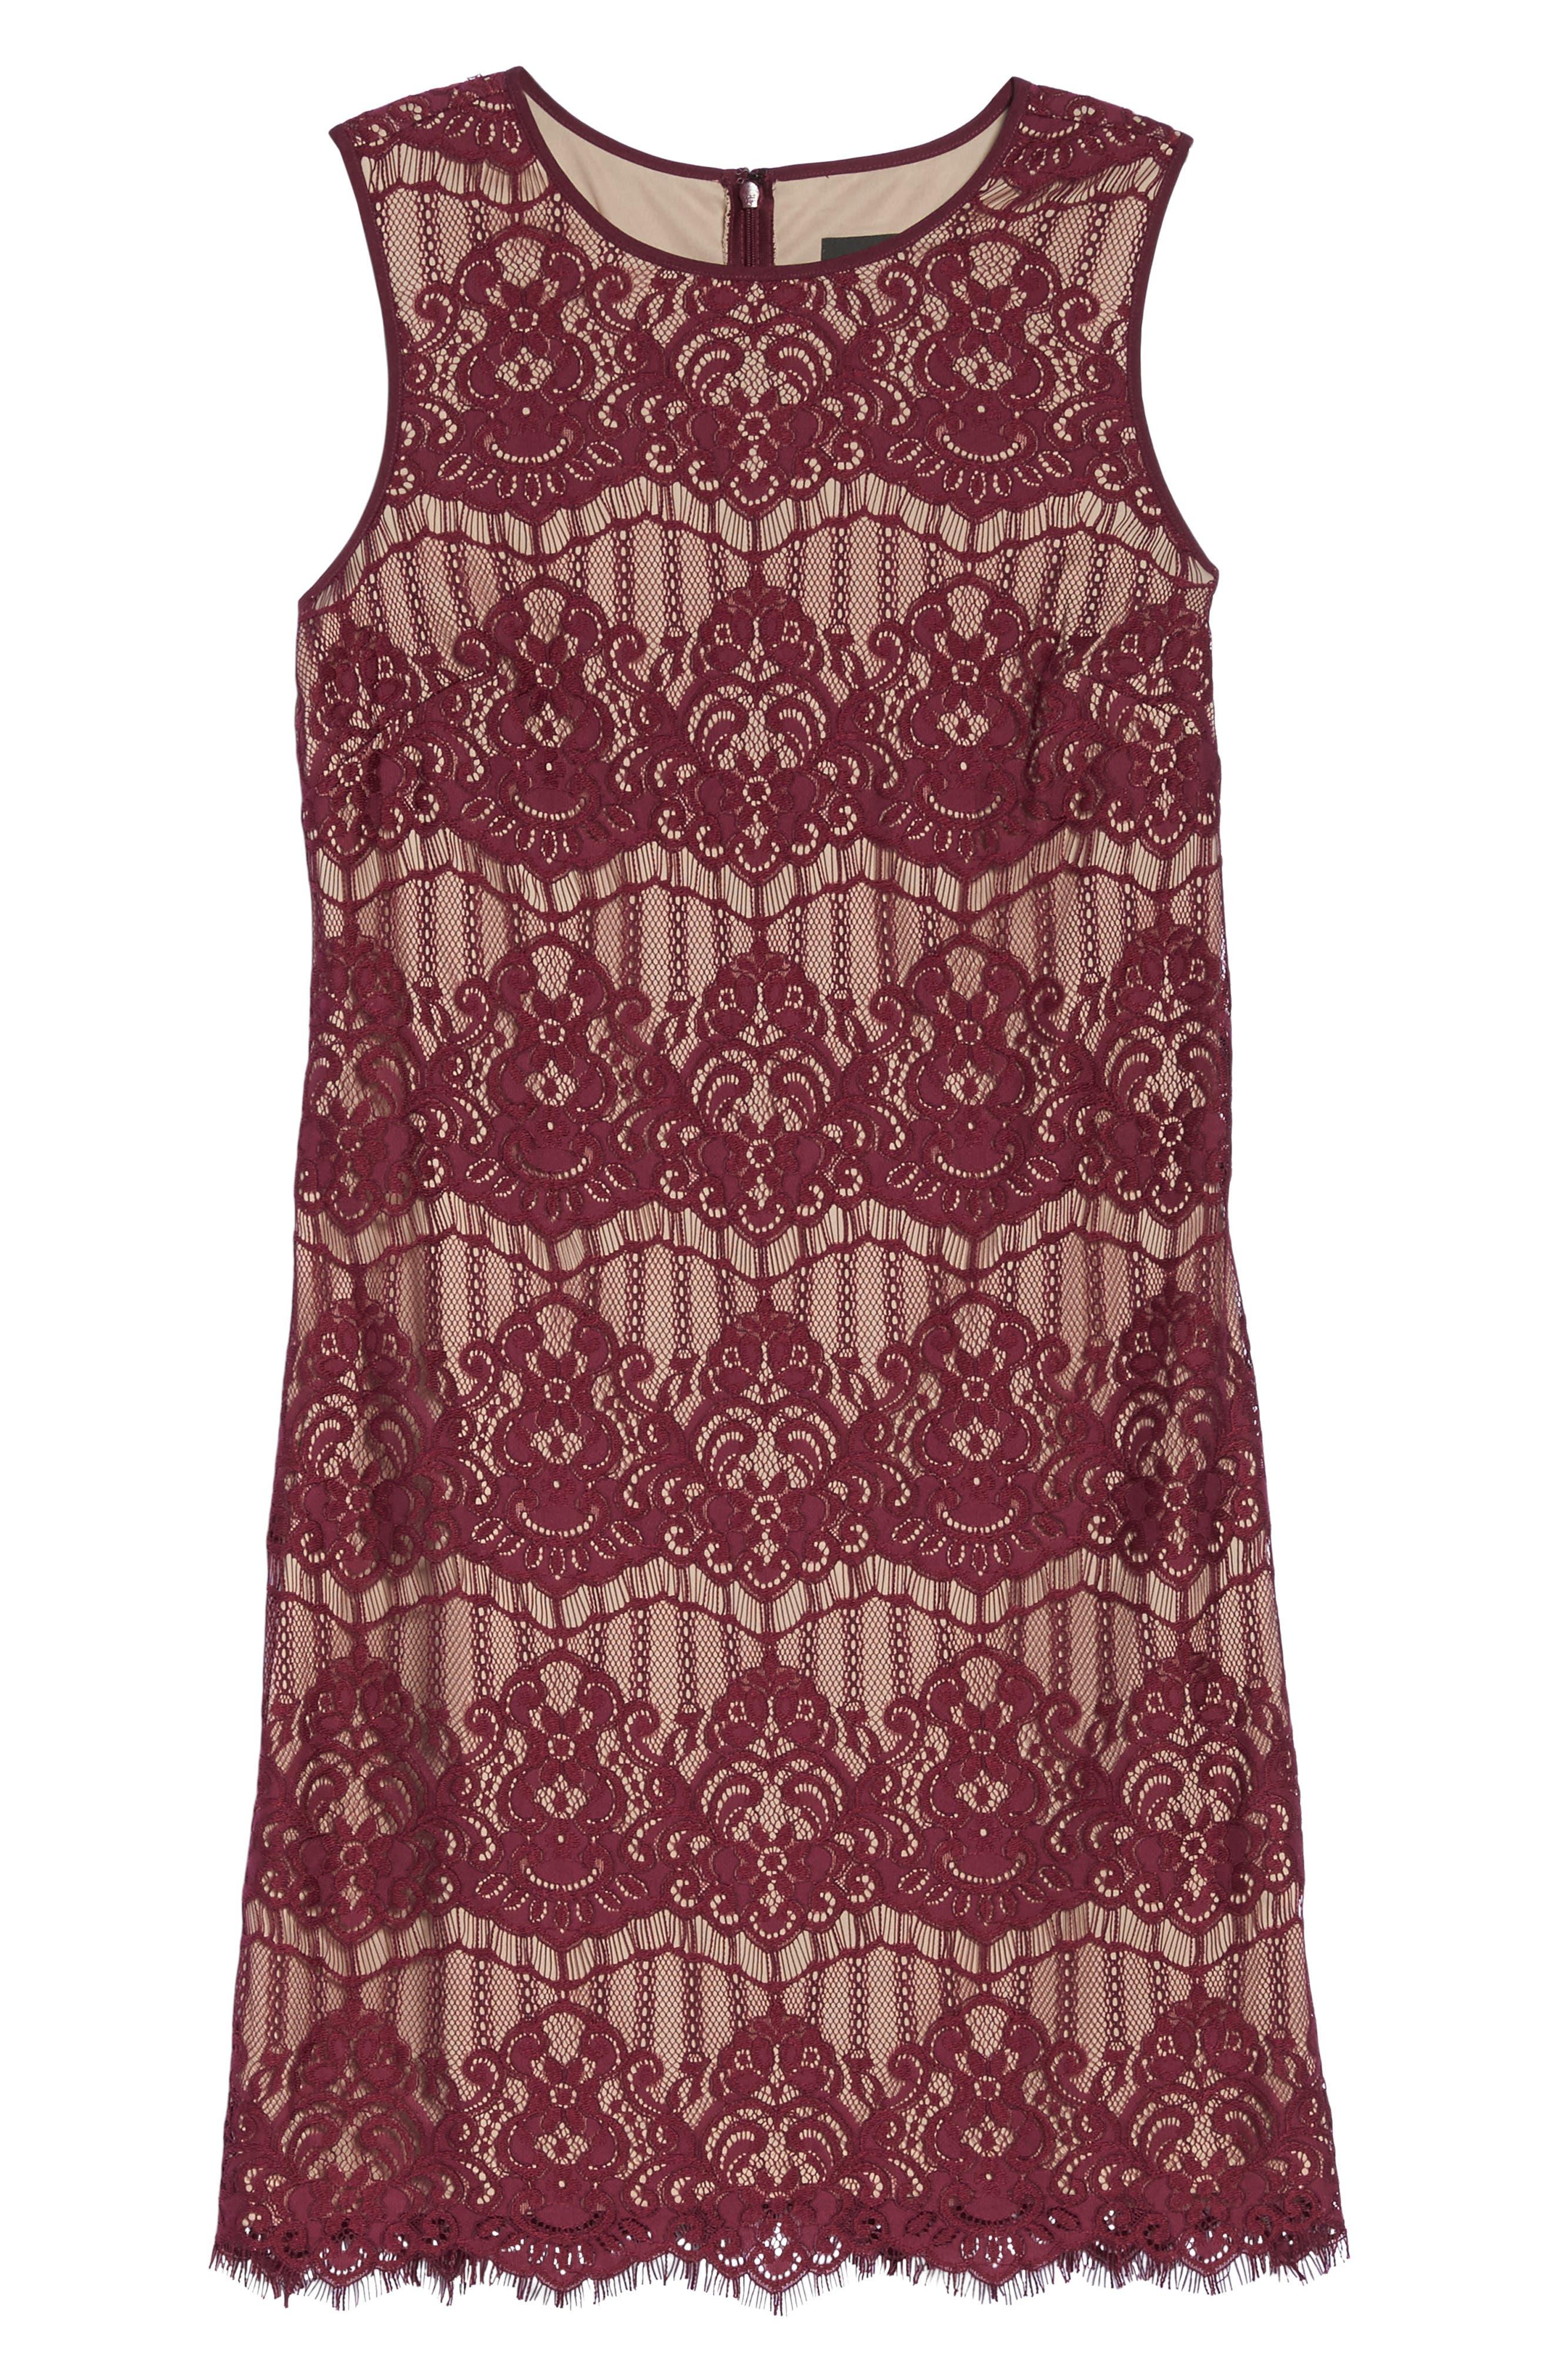 Scalloped Lace Sheath Dress,                             Alternate thumbnail 6, color,                             640